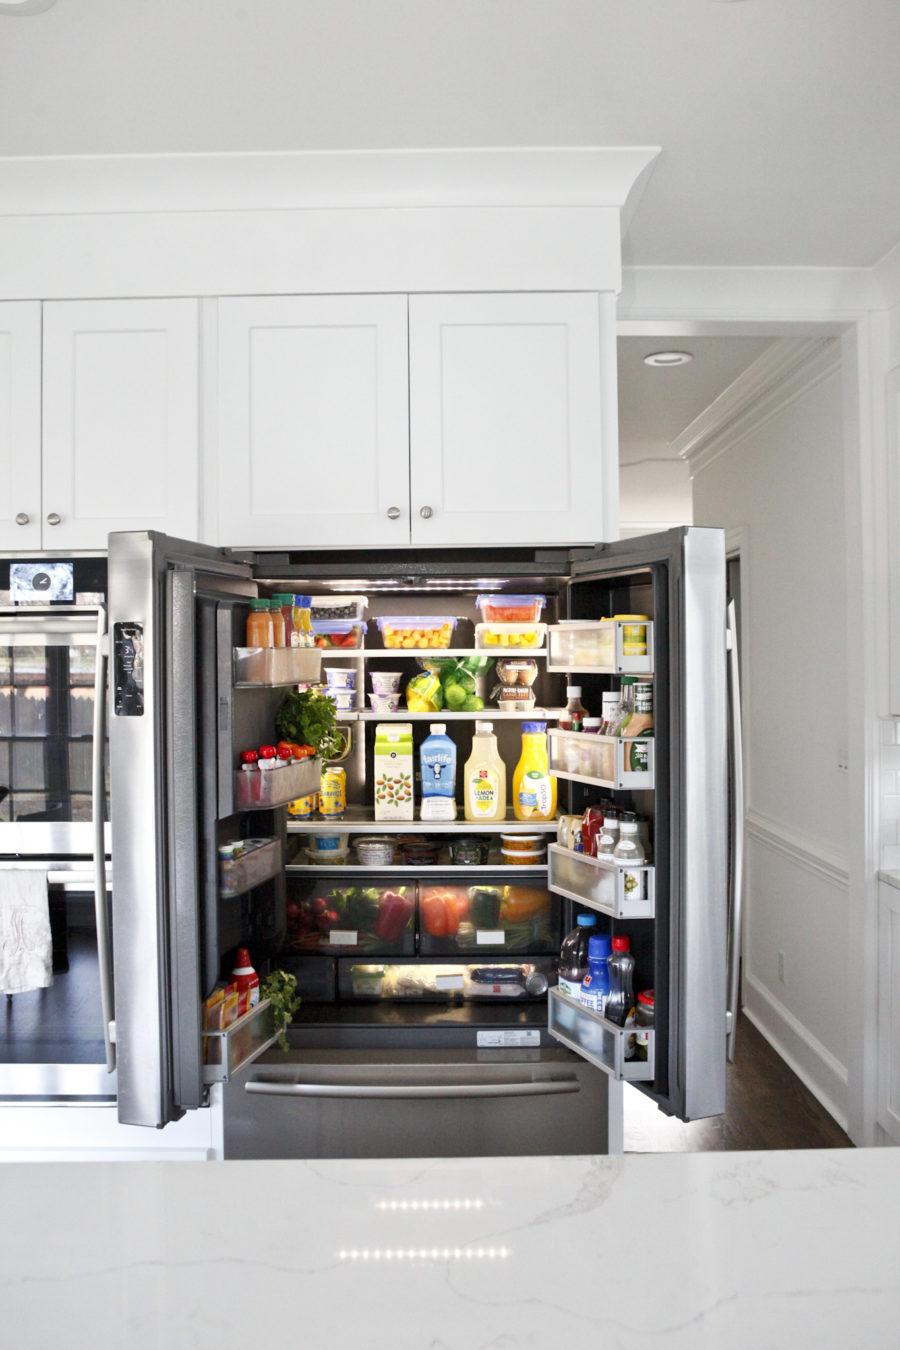 Our Kitchen Appliances